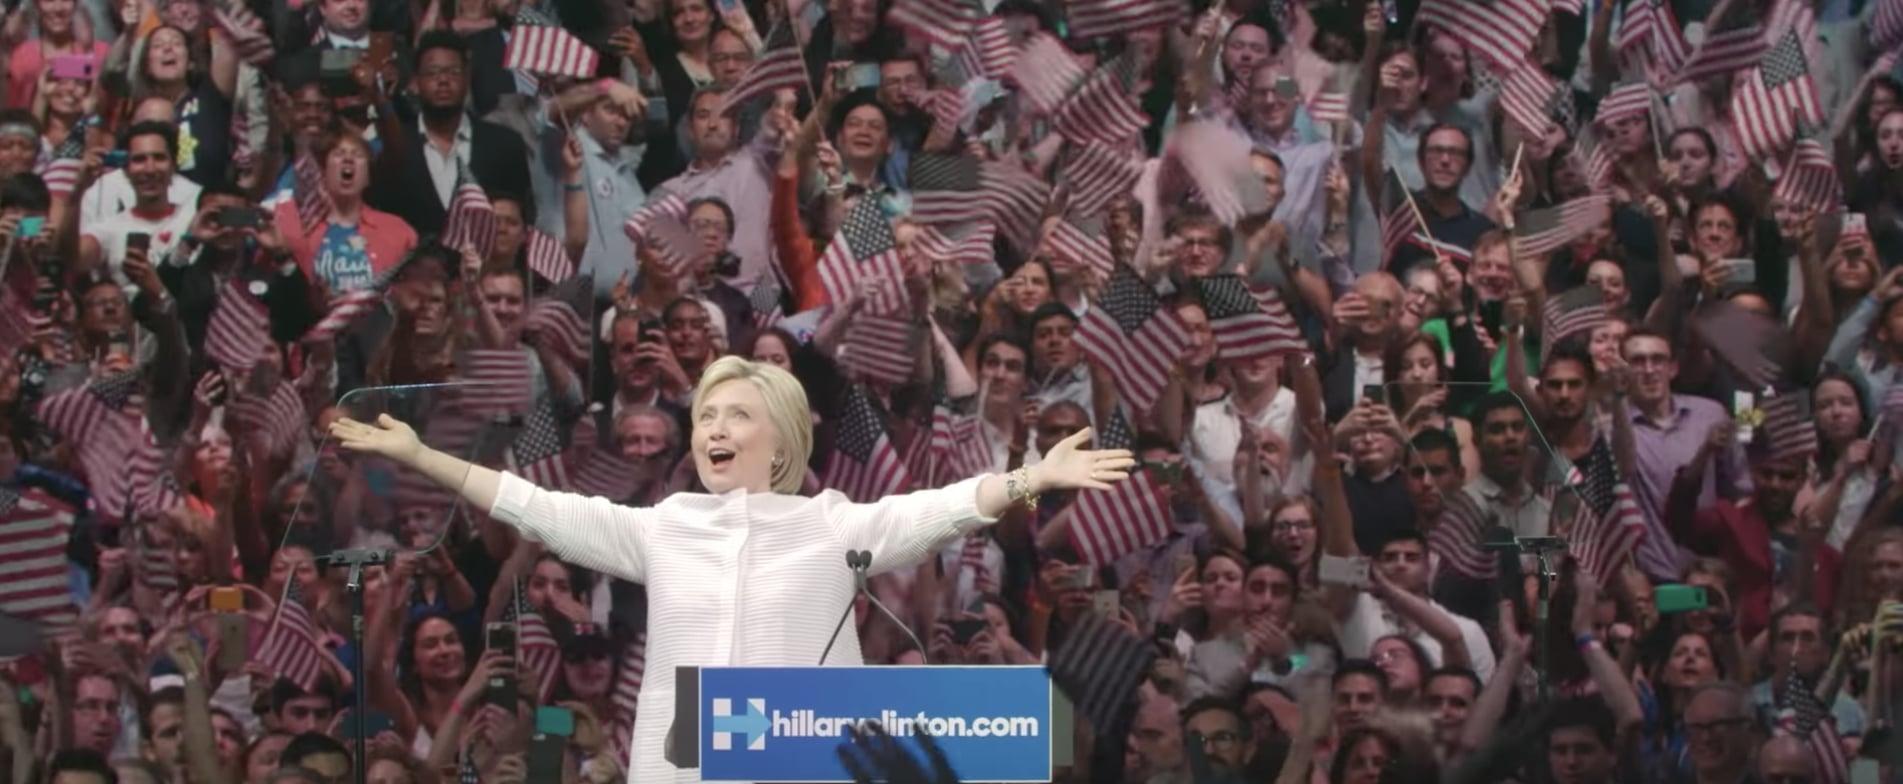 Hillary Clinton Hulu Documentary Trailer —Video